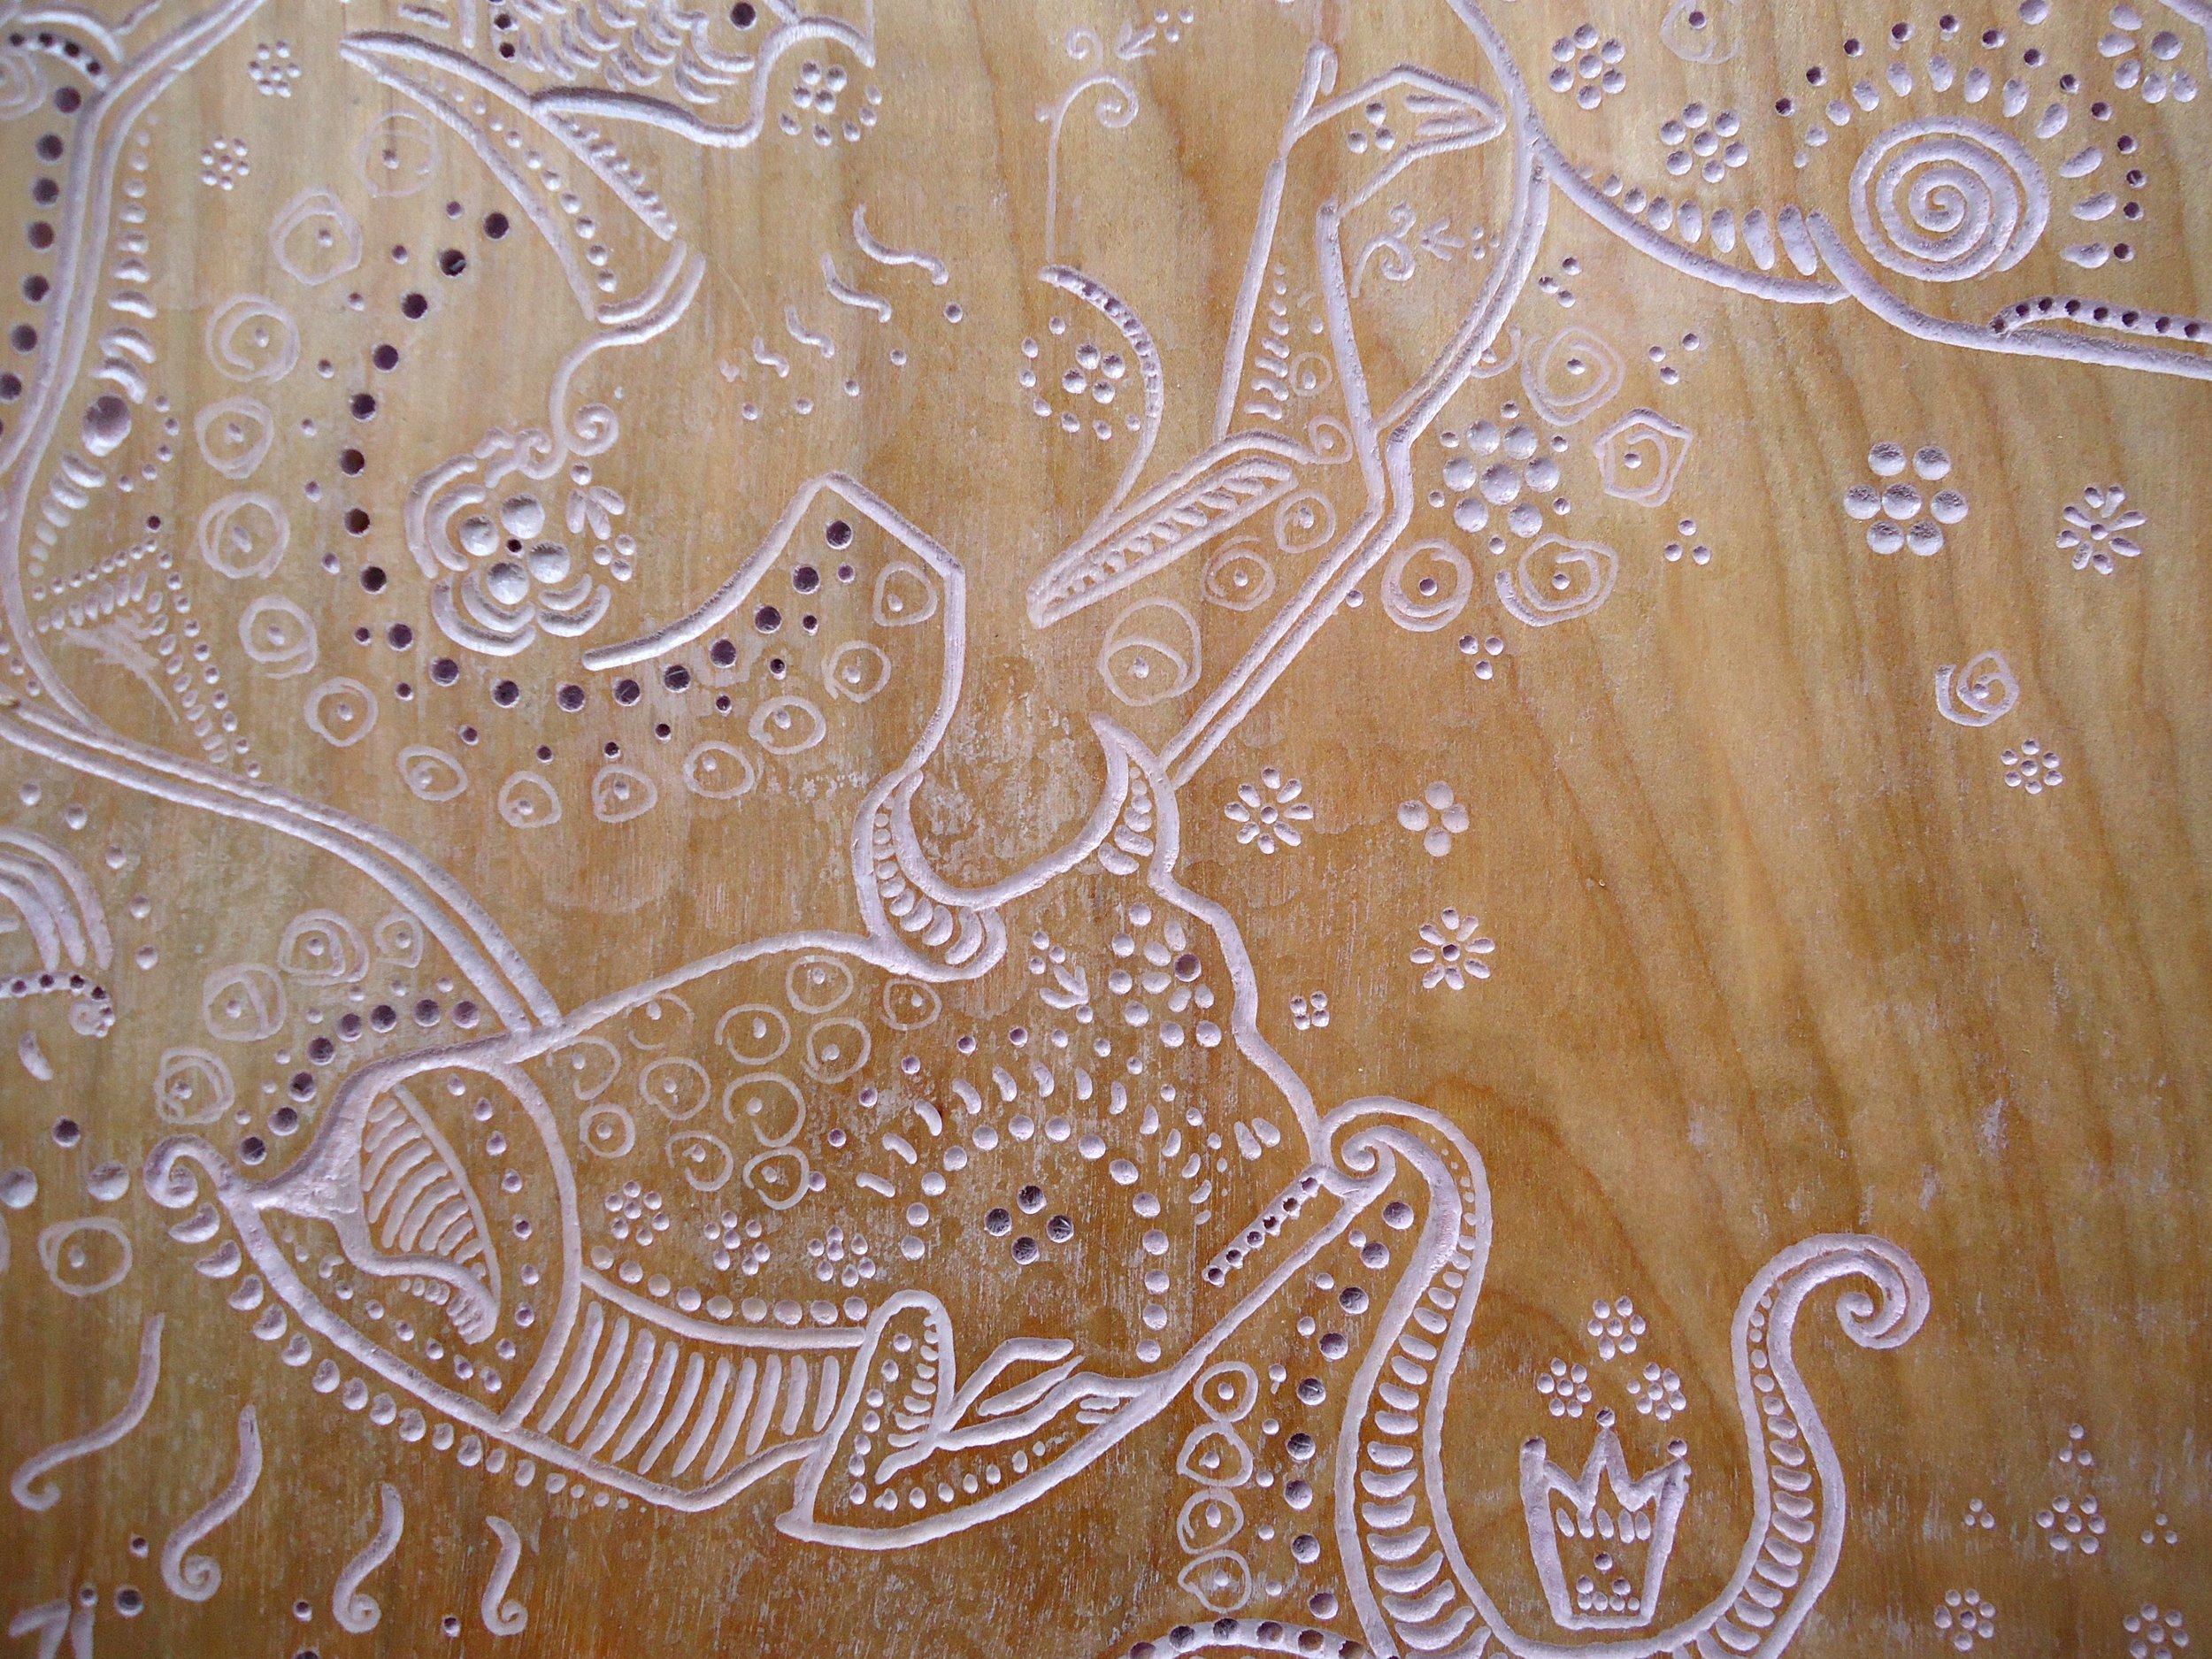 jason-borders-detailed-carving-patterns.JPG